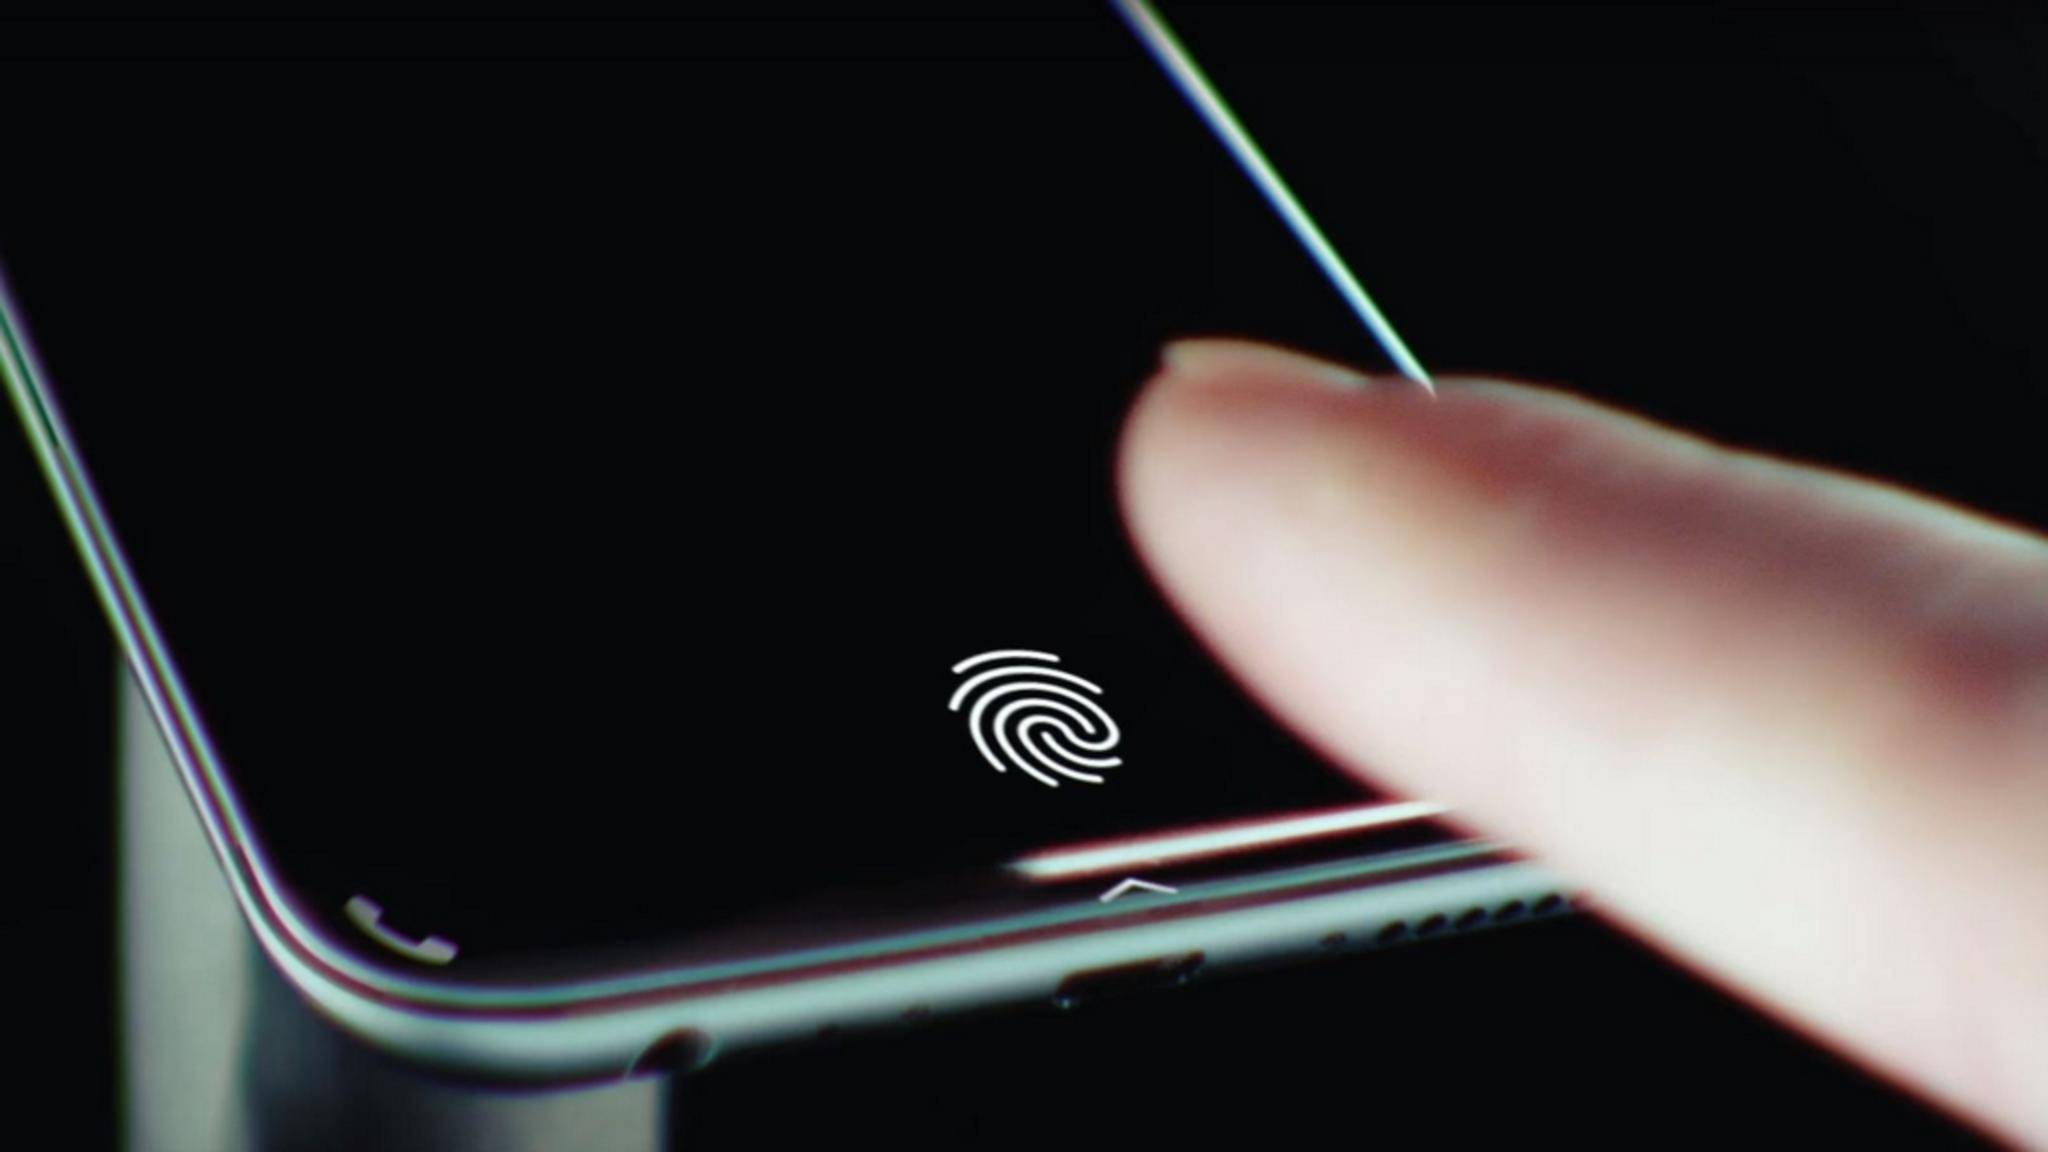 Qualcomm packt den Fingerabdruckscanner unter das Smartphone-Display.